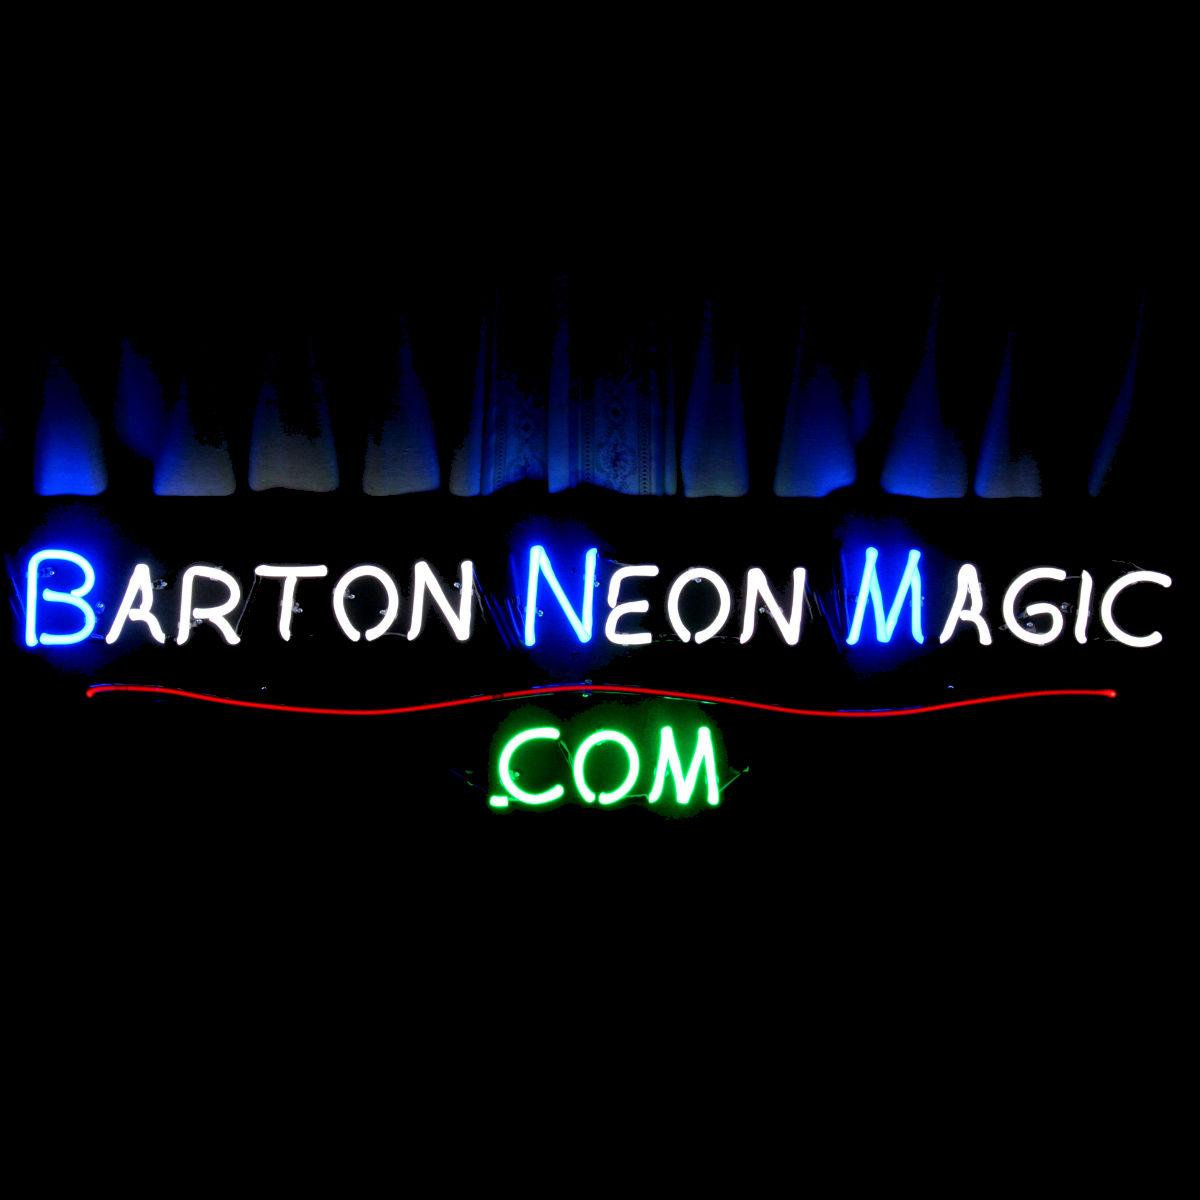 Singer Musician Stage Set Custom Neon by John Barton - BartonNeonMagic.com